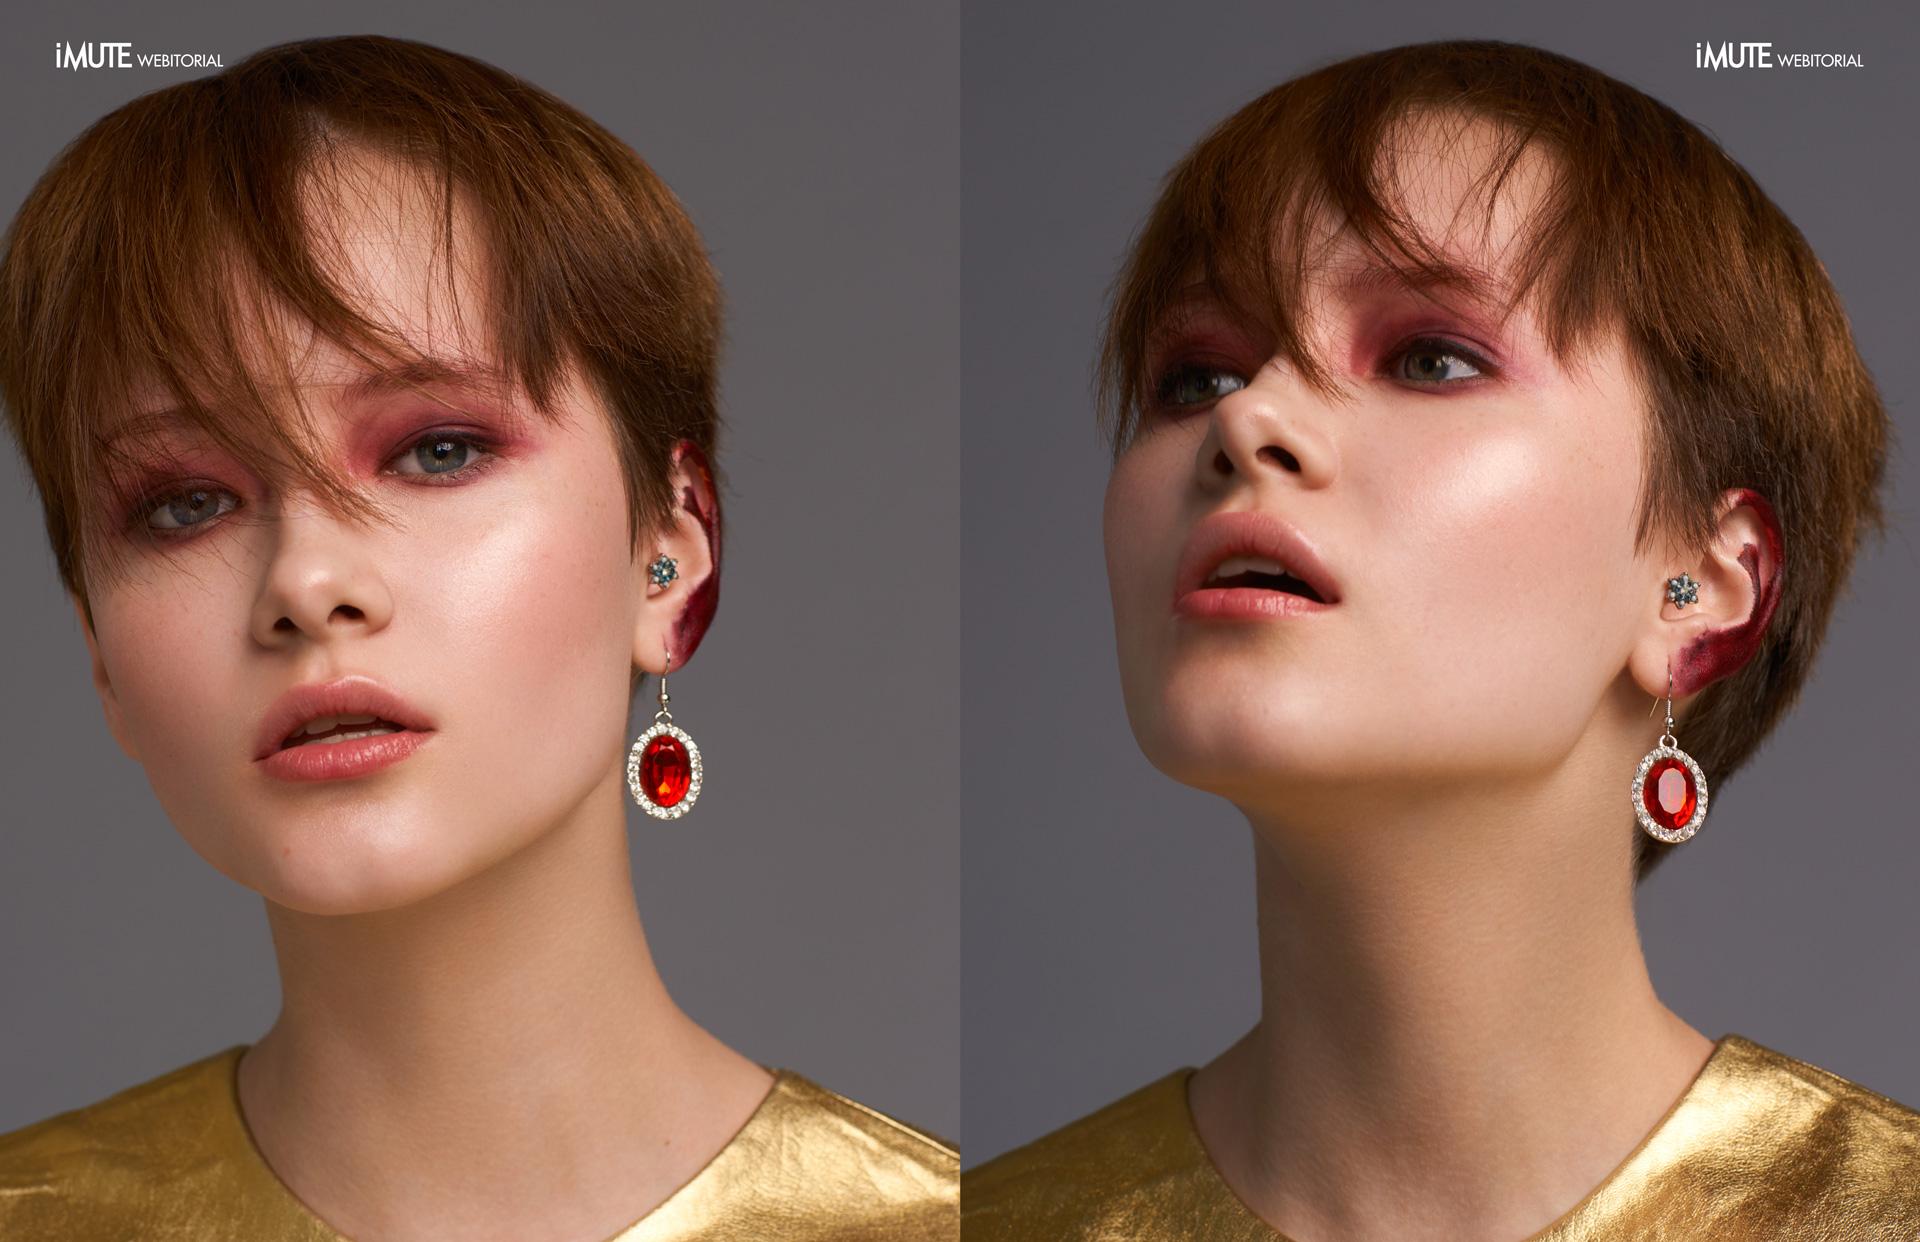 Anna webitorial for iMute Magazine Photographer Anna Kirikova Model  Anna @Rush Models Stylist Varya Kuzmina Makeup & Hair July Plotnikova